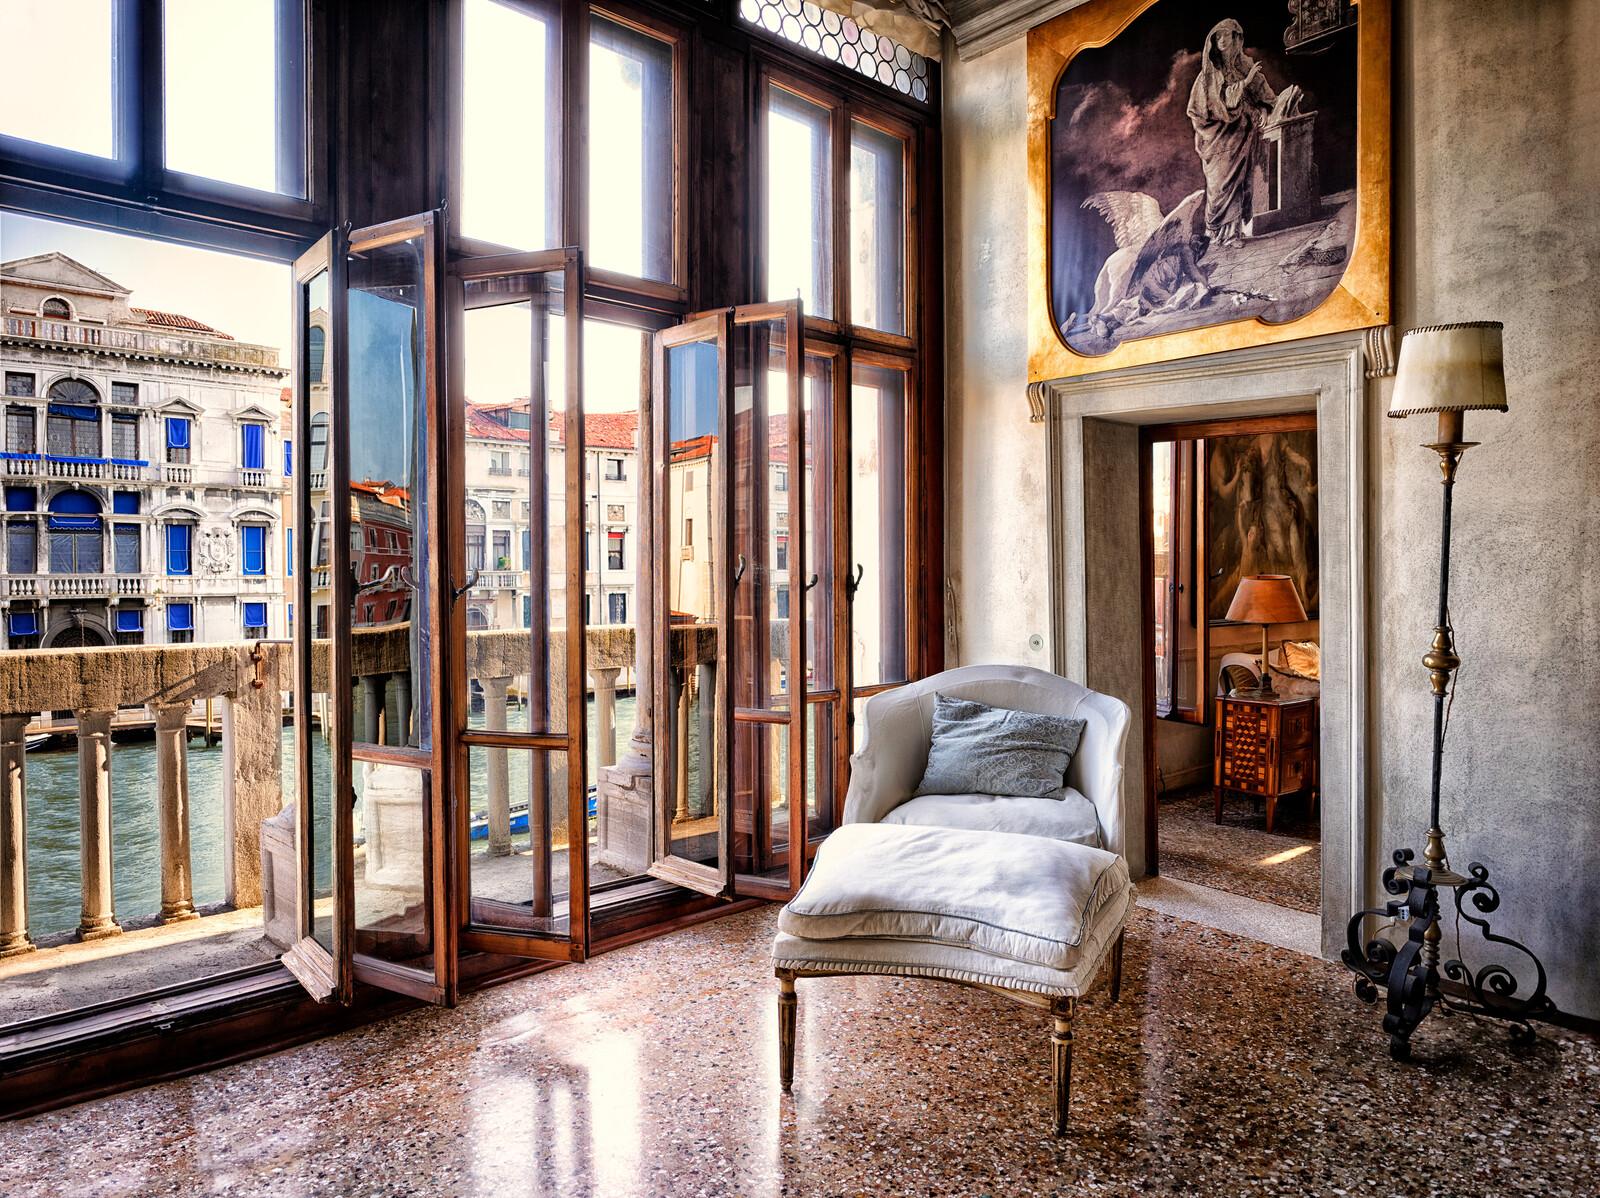 Palazzo di Victoria II - Werner Pawlok